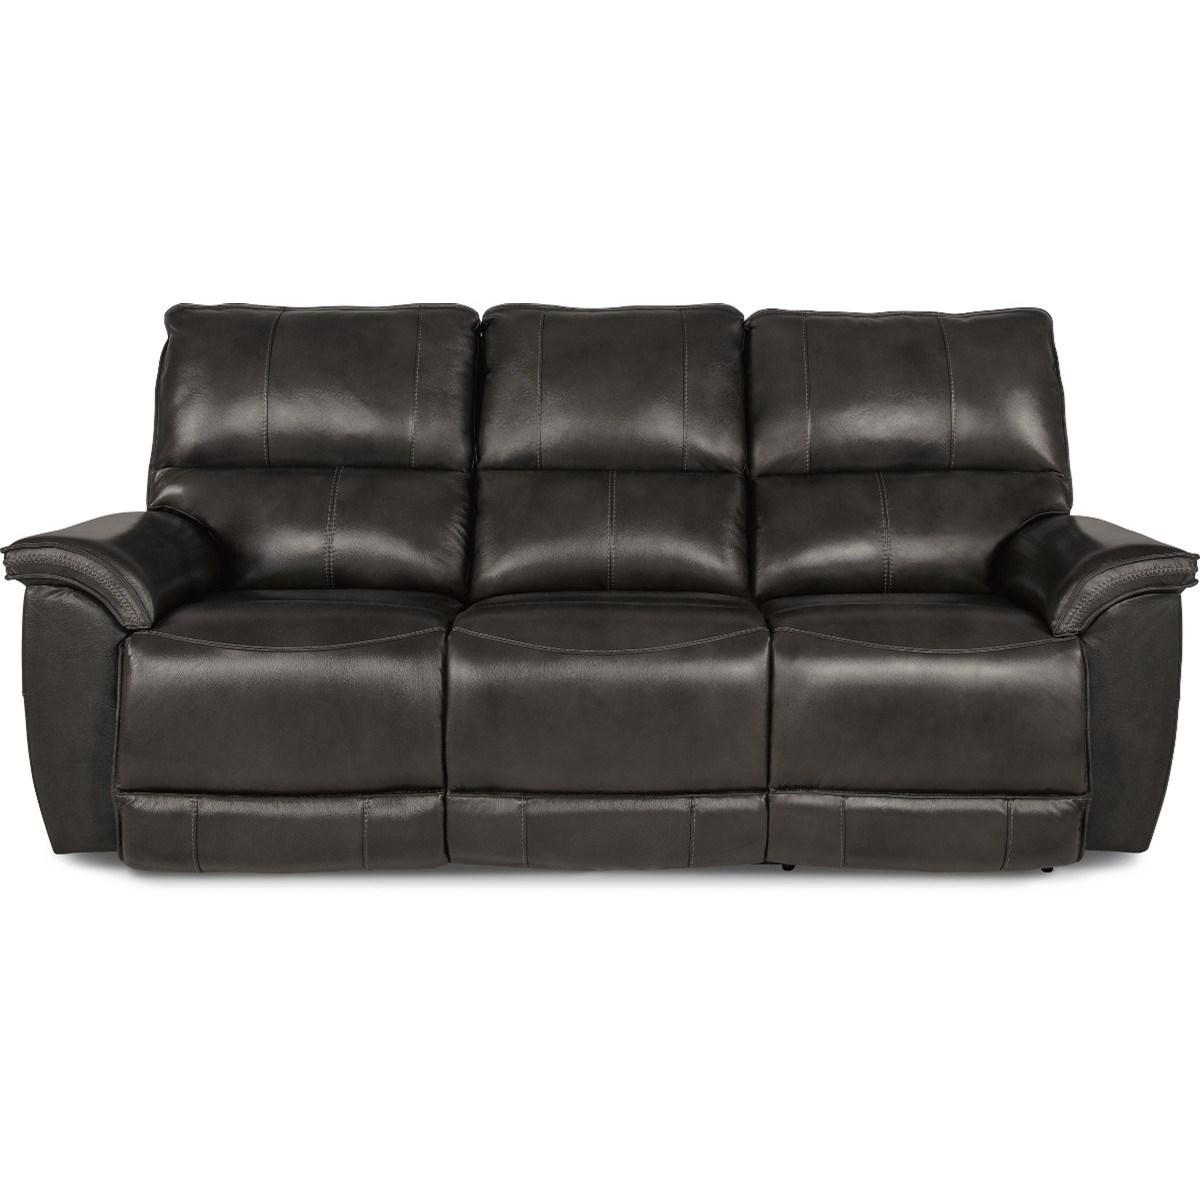 Power-Recline Sofa with Power Headrest